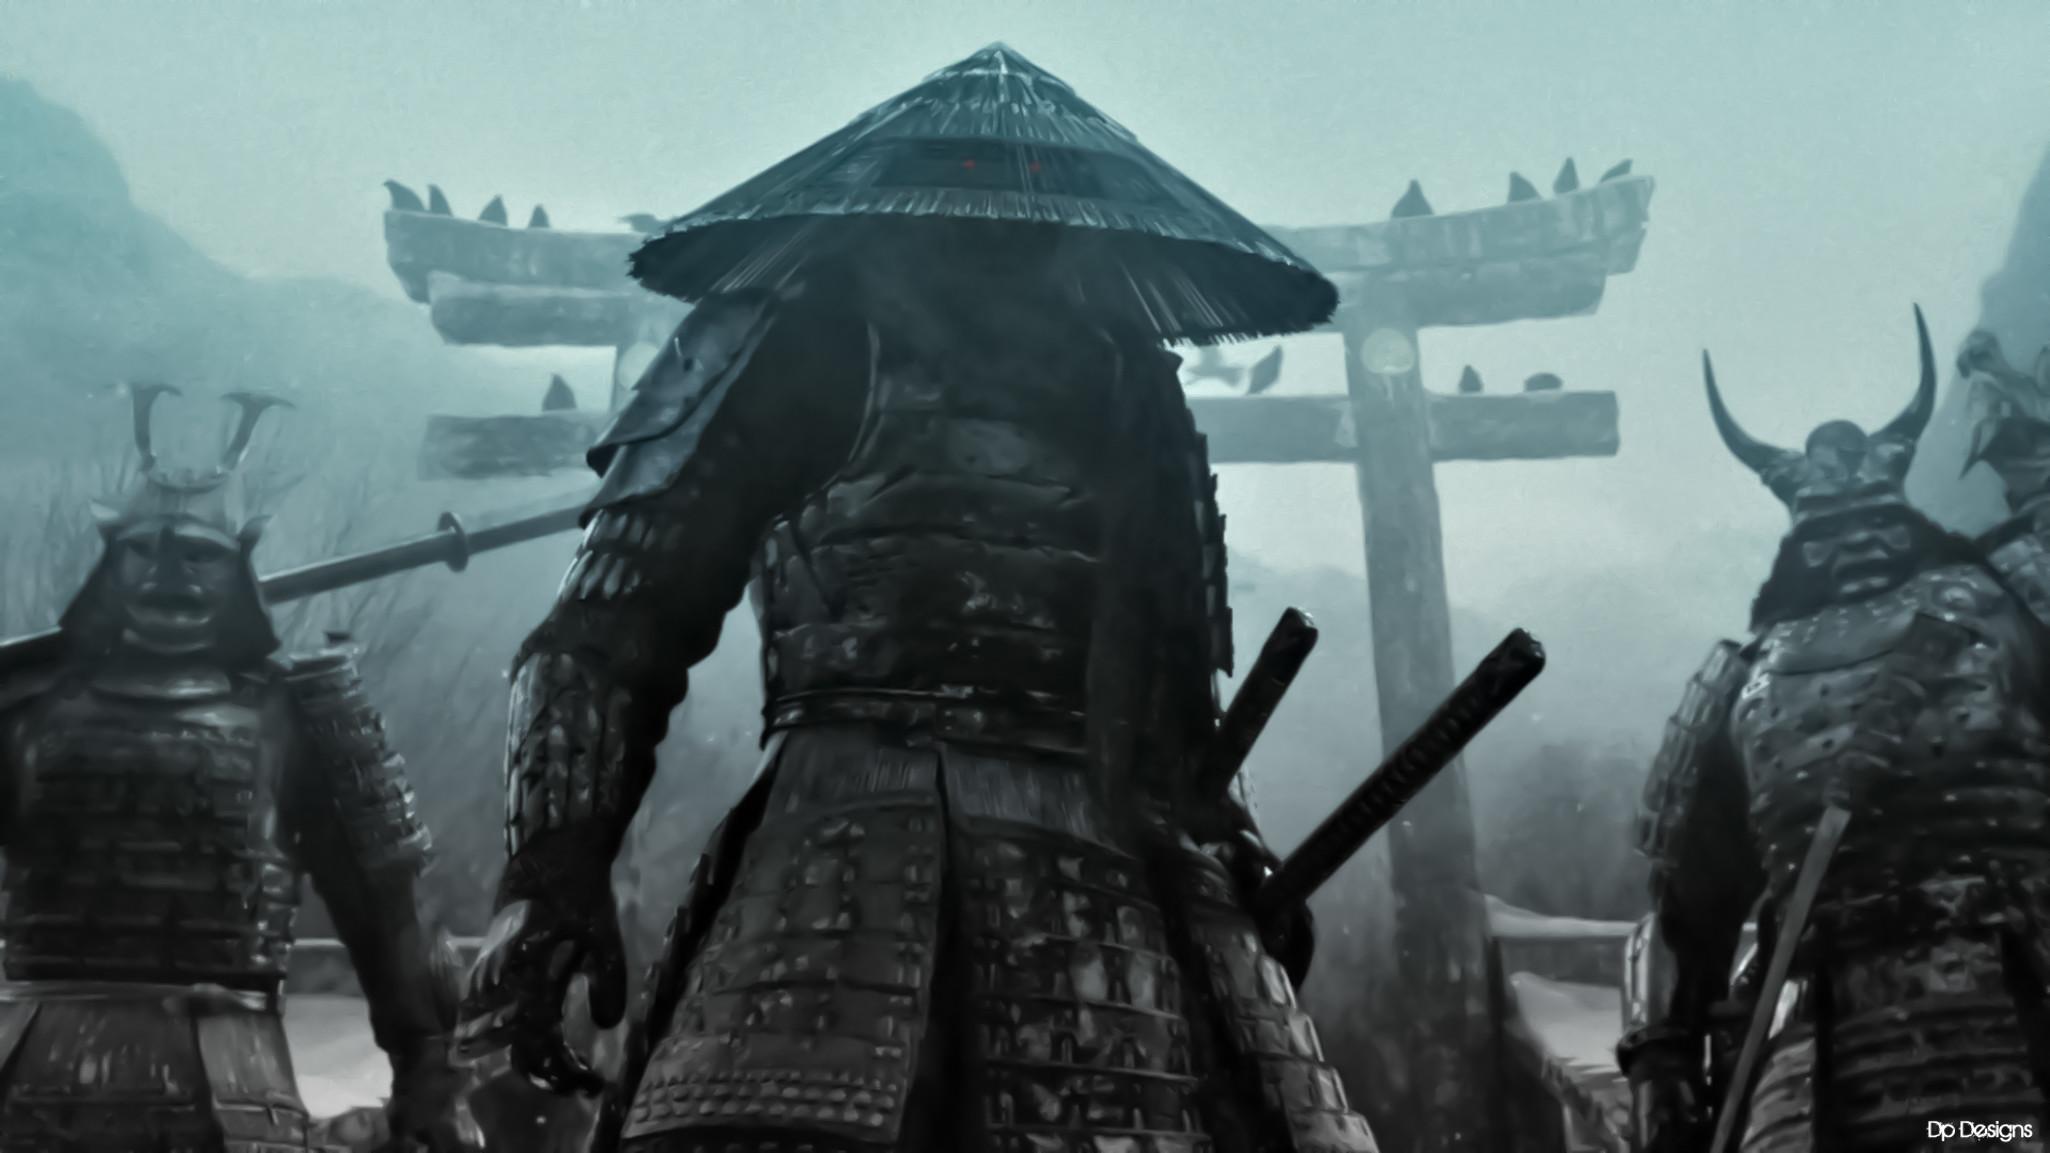 Res: 2050x1153, Filme - Sucker Punch Düster Samurai Filme Wallpaper